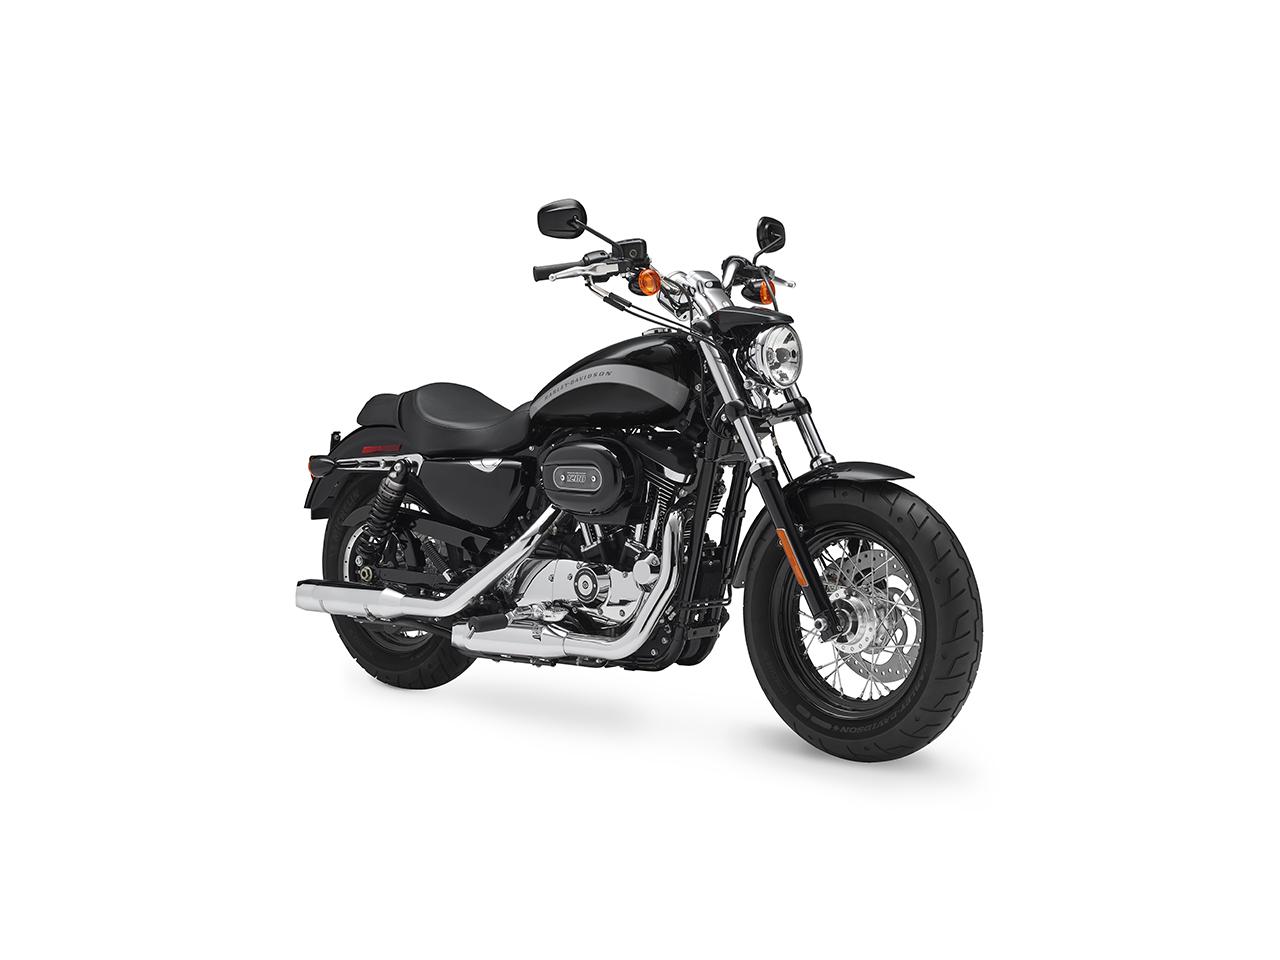 2018 Harley-Davidson Sportster 1200 Custom Image